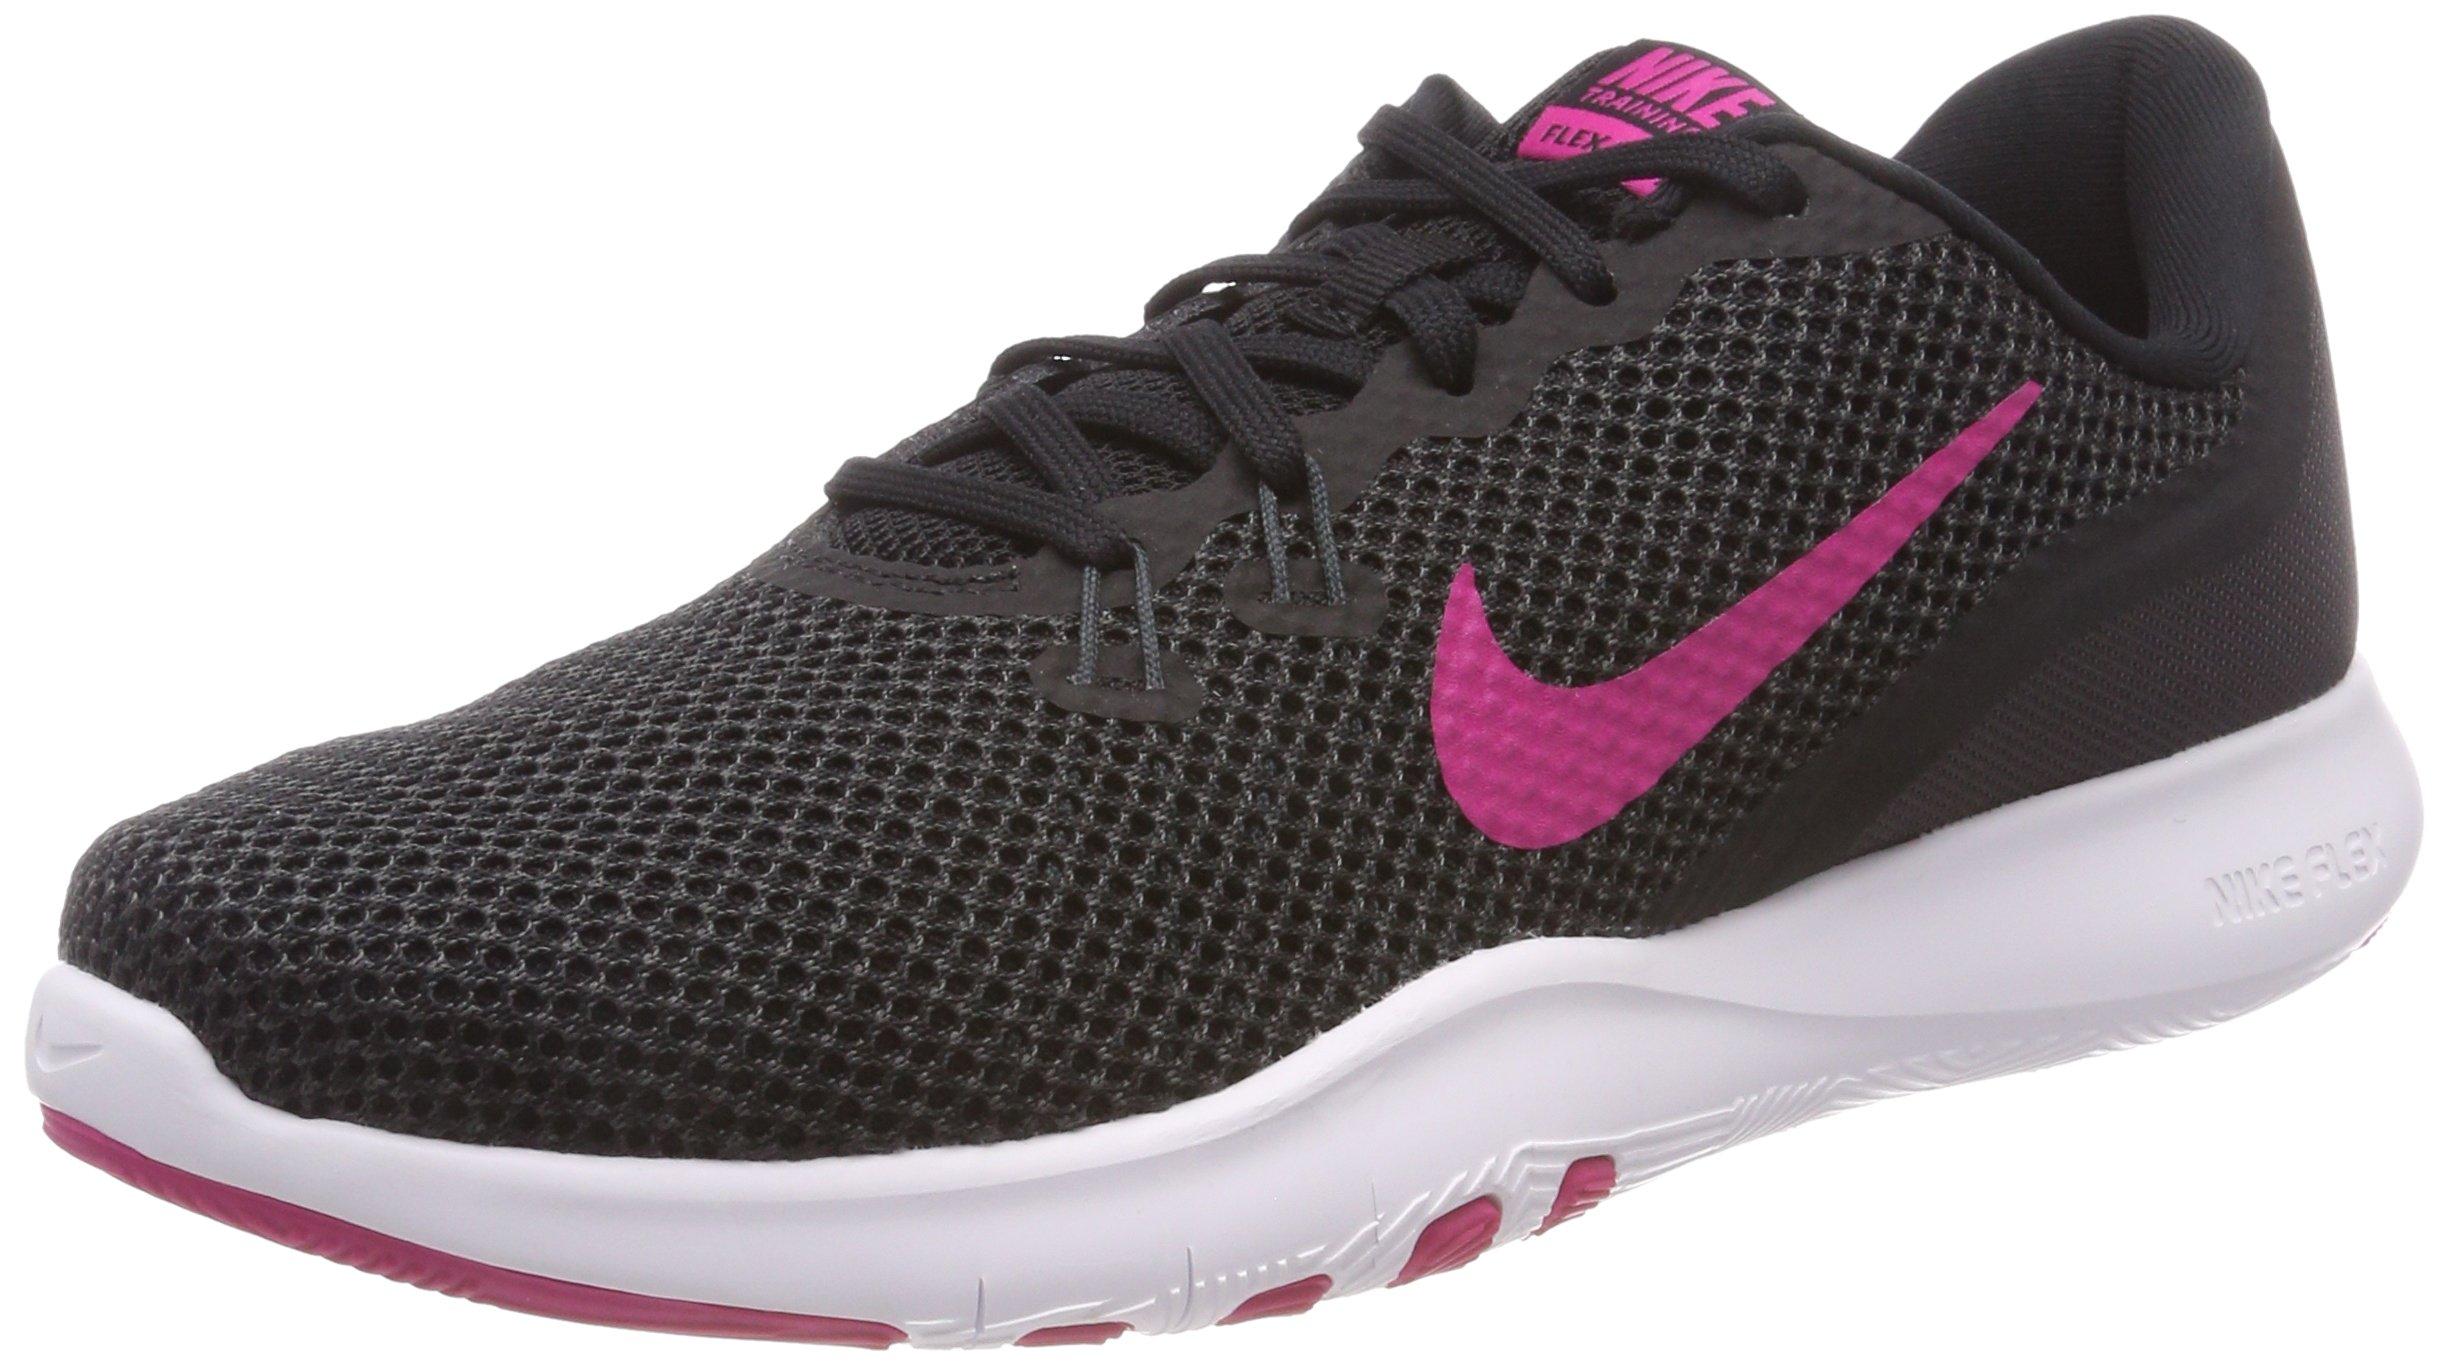 Galleon - NIKE Womens Flex Trainer 7 Running Trainers 898479 Sneakers Shoes  (UK 7 US 9.5 EU 41 b9aaedbdc3746